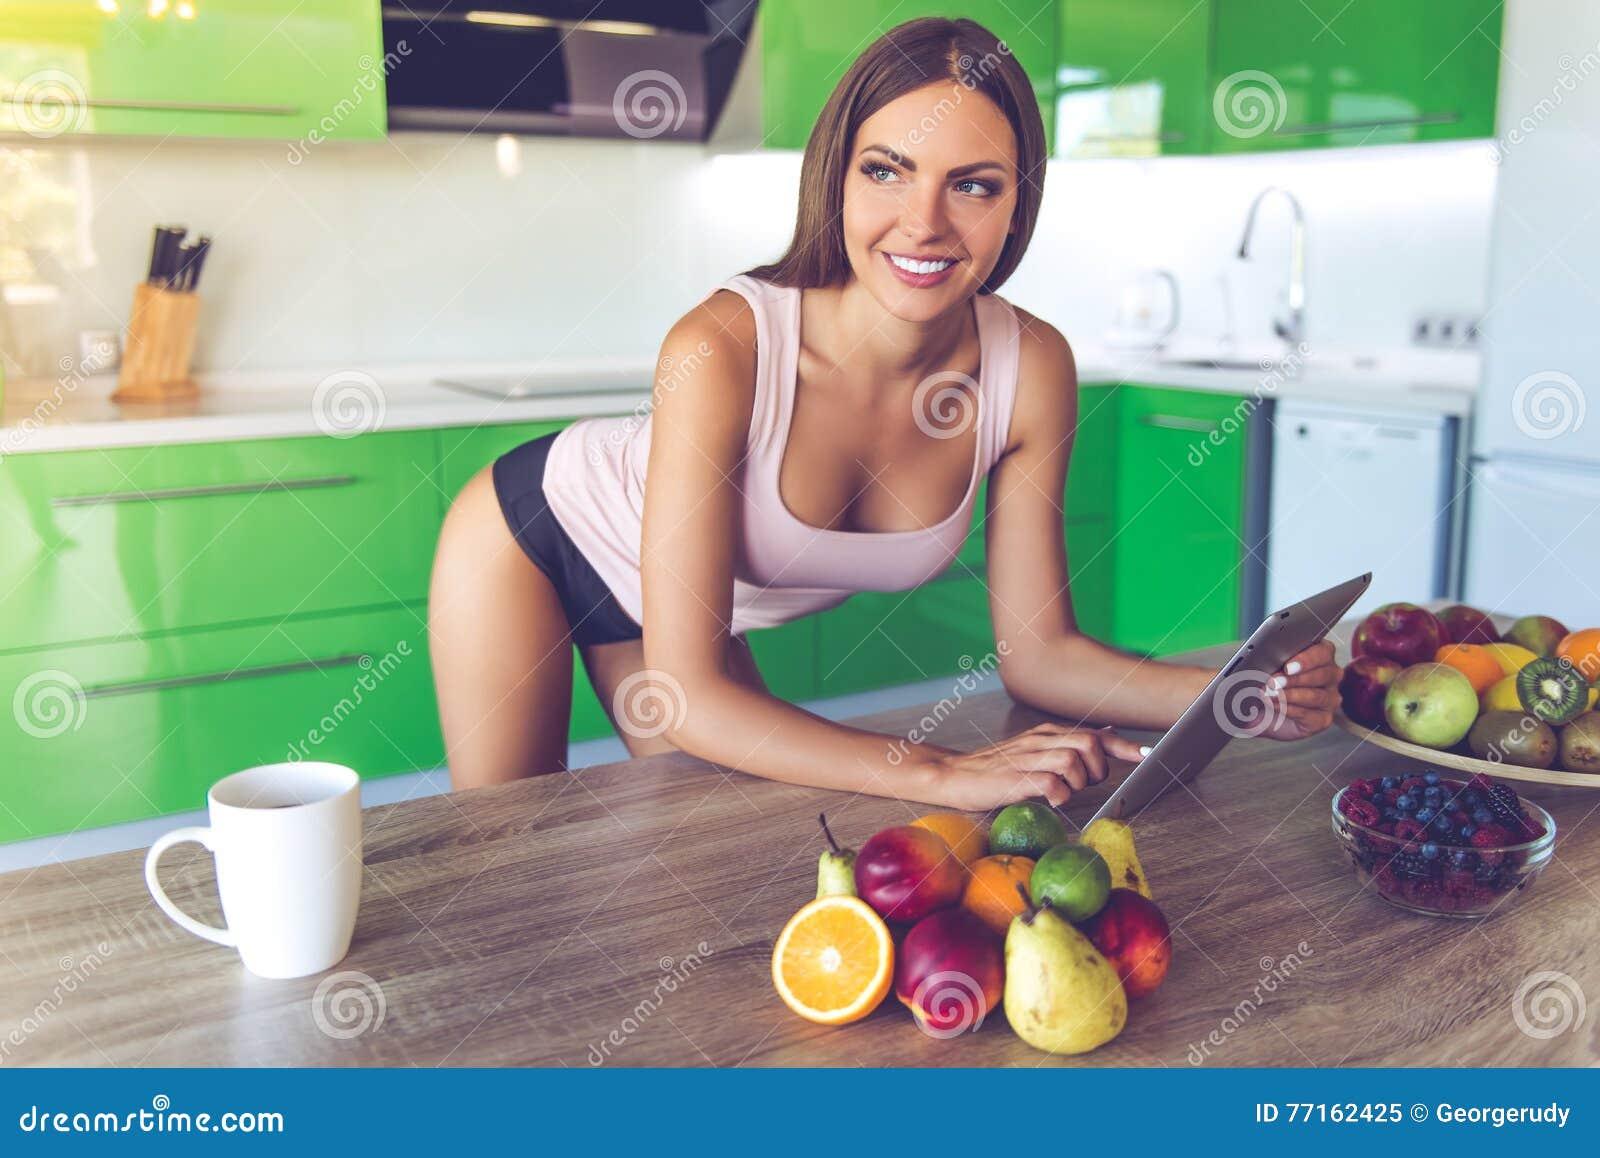 belle fille sexy dans la cuisine image stock image du maigre caucasien 77162425. Black Bedroom Furniture Sets. Home Design Ideas